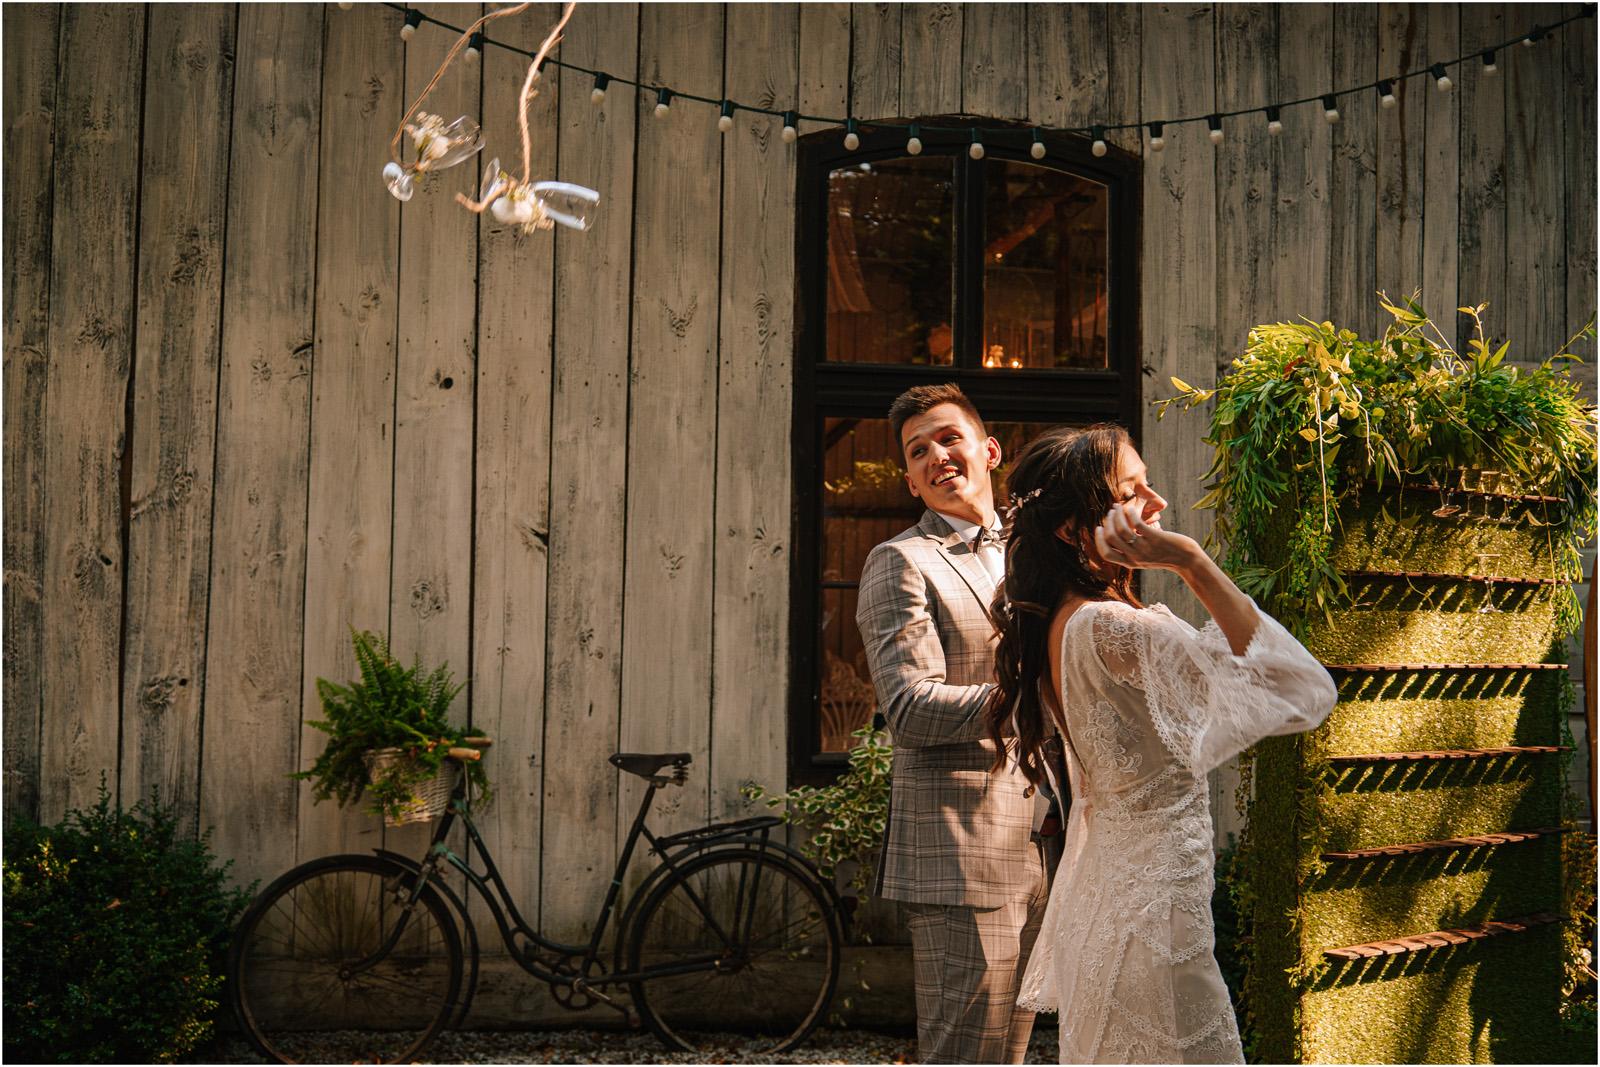 Ania & Mateusz | boho wesele w Stodole pod Kasztanami 76